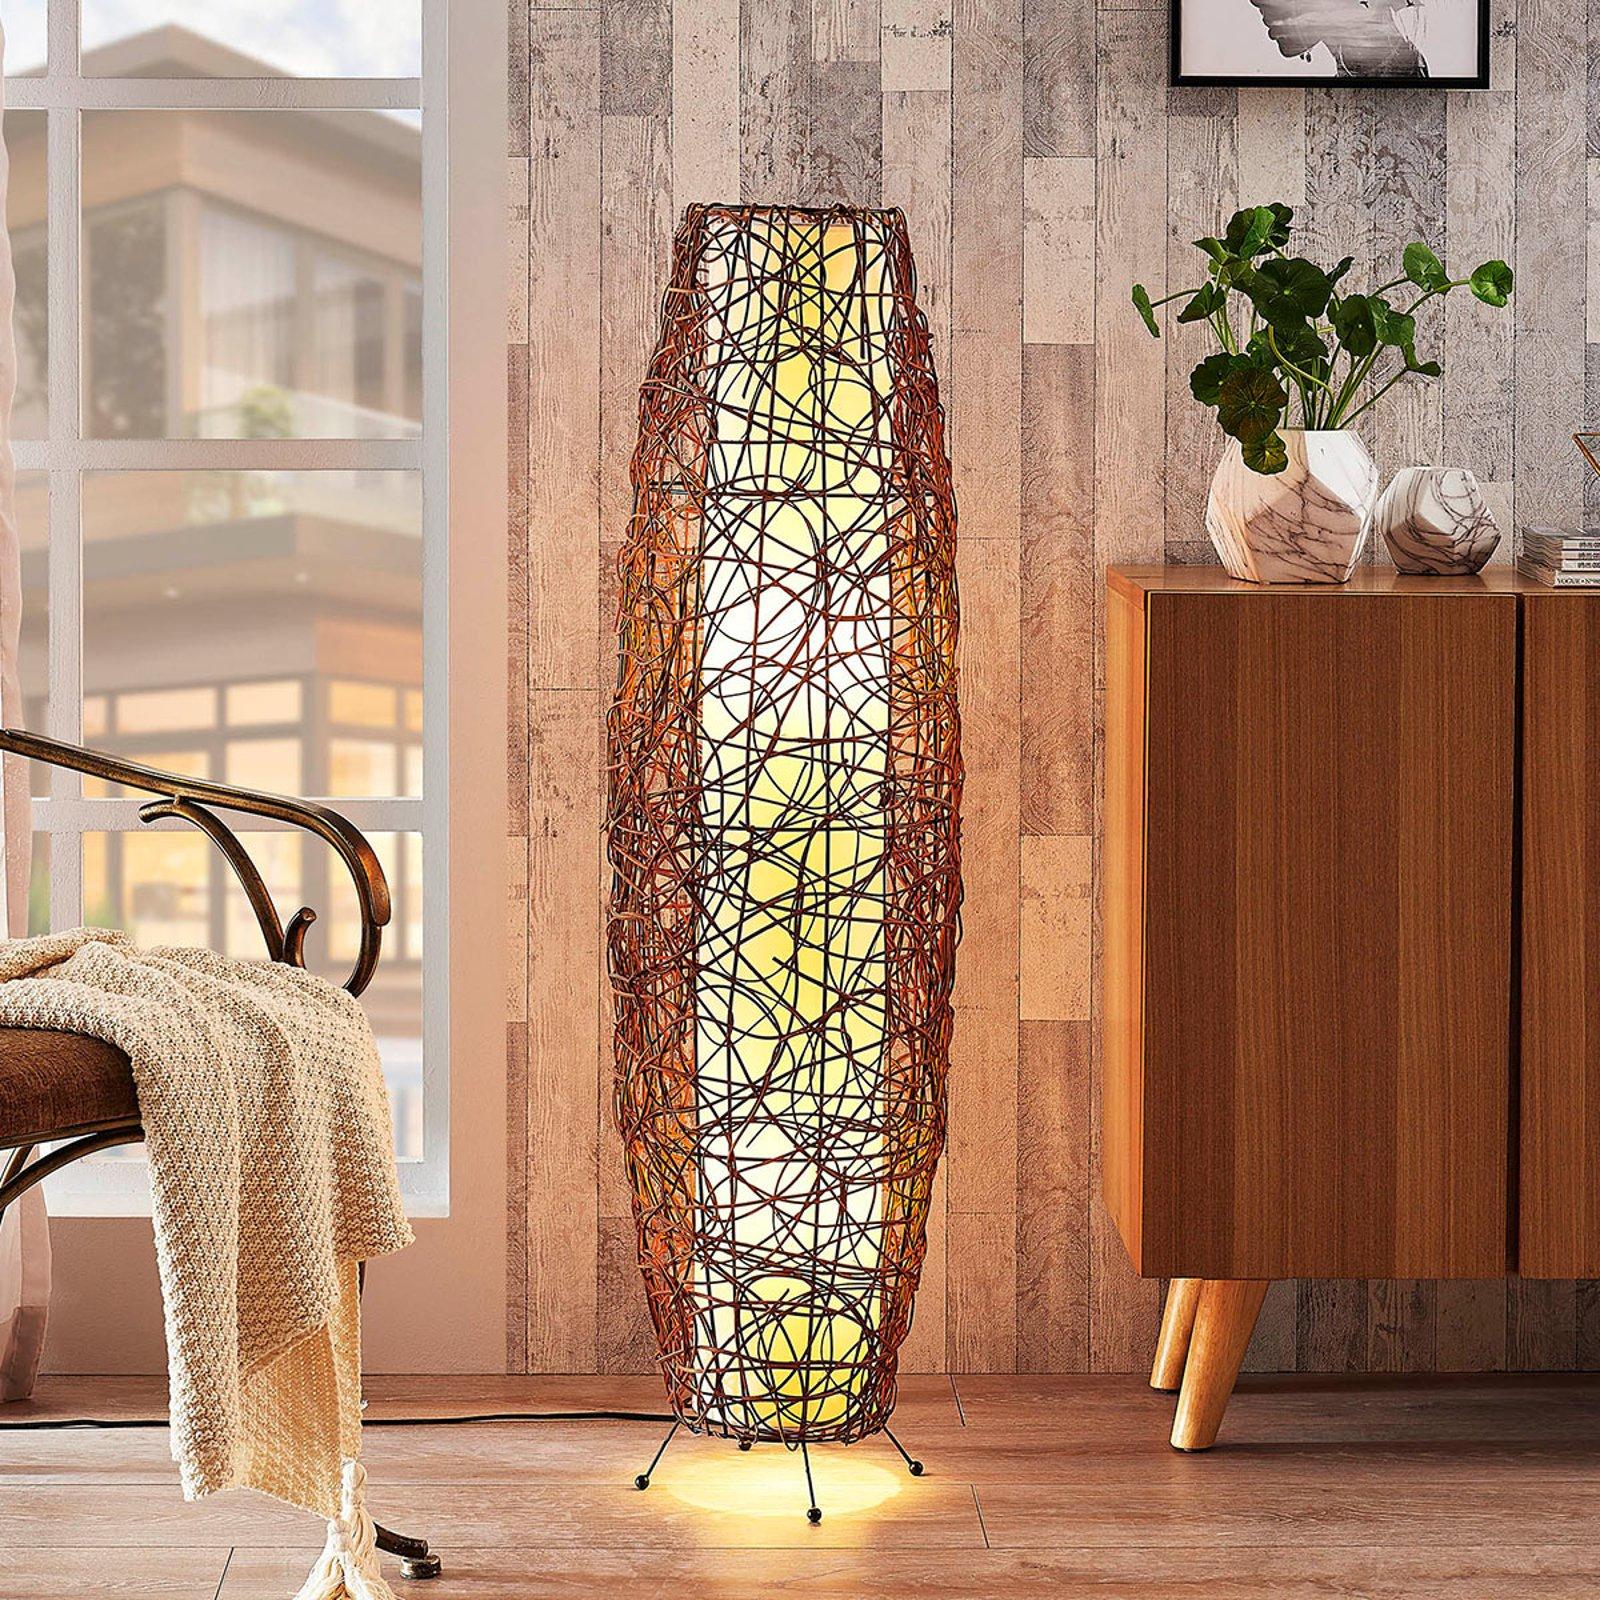 Nias - rund gulvlampe i rotting og tekstil